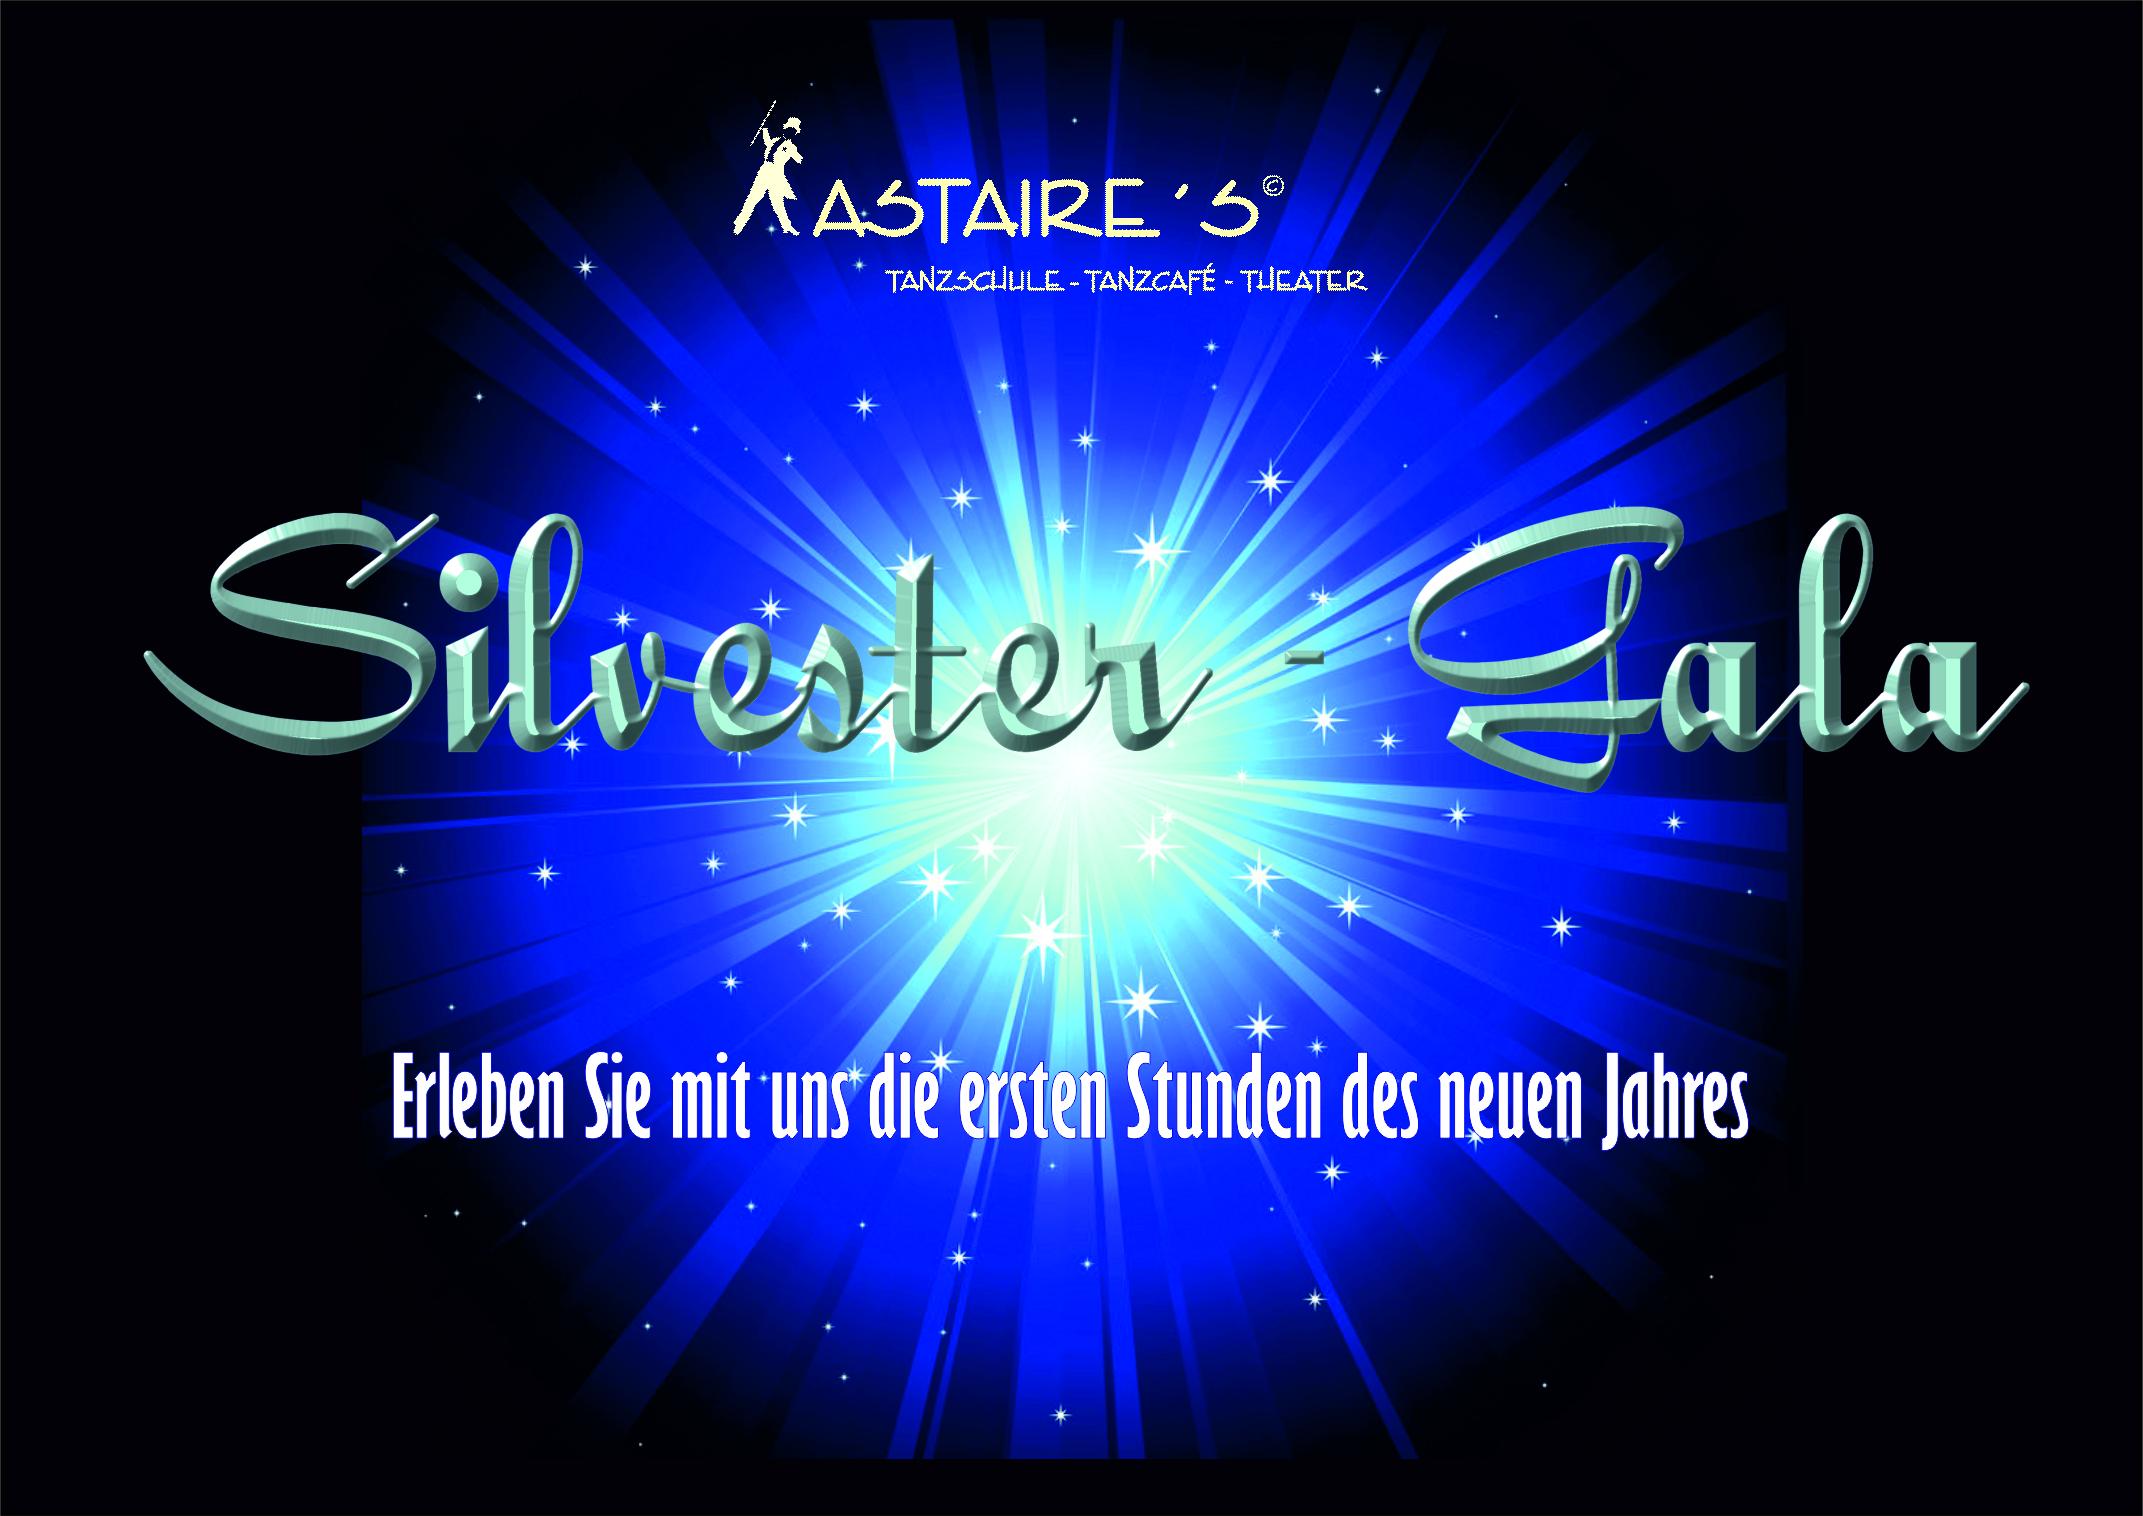 31.12.2019 – Silvester – Gala